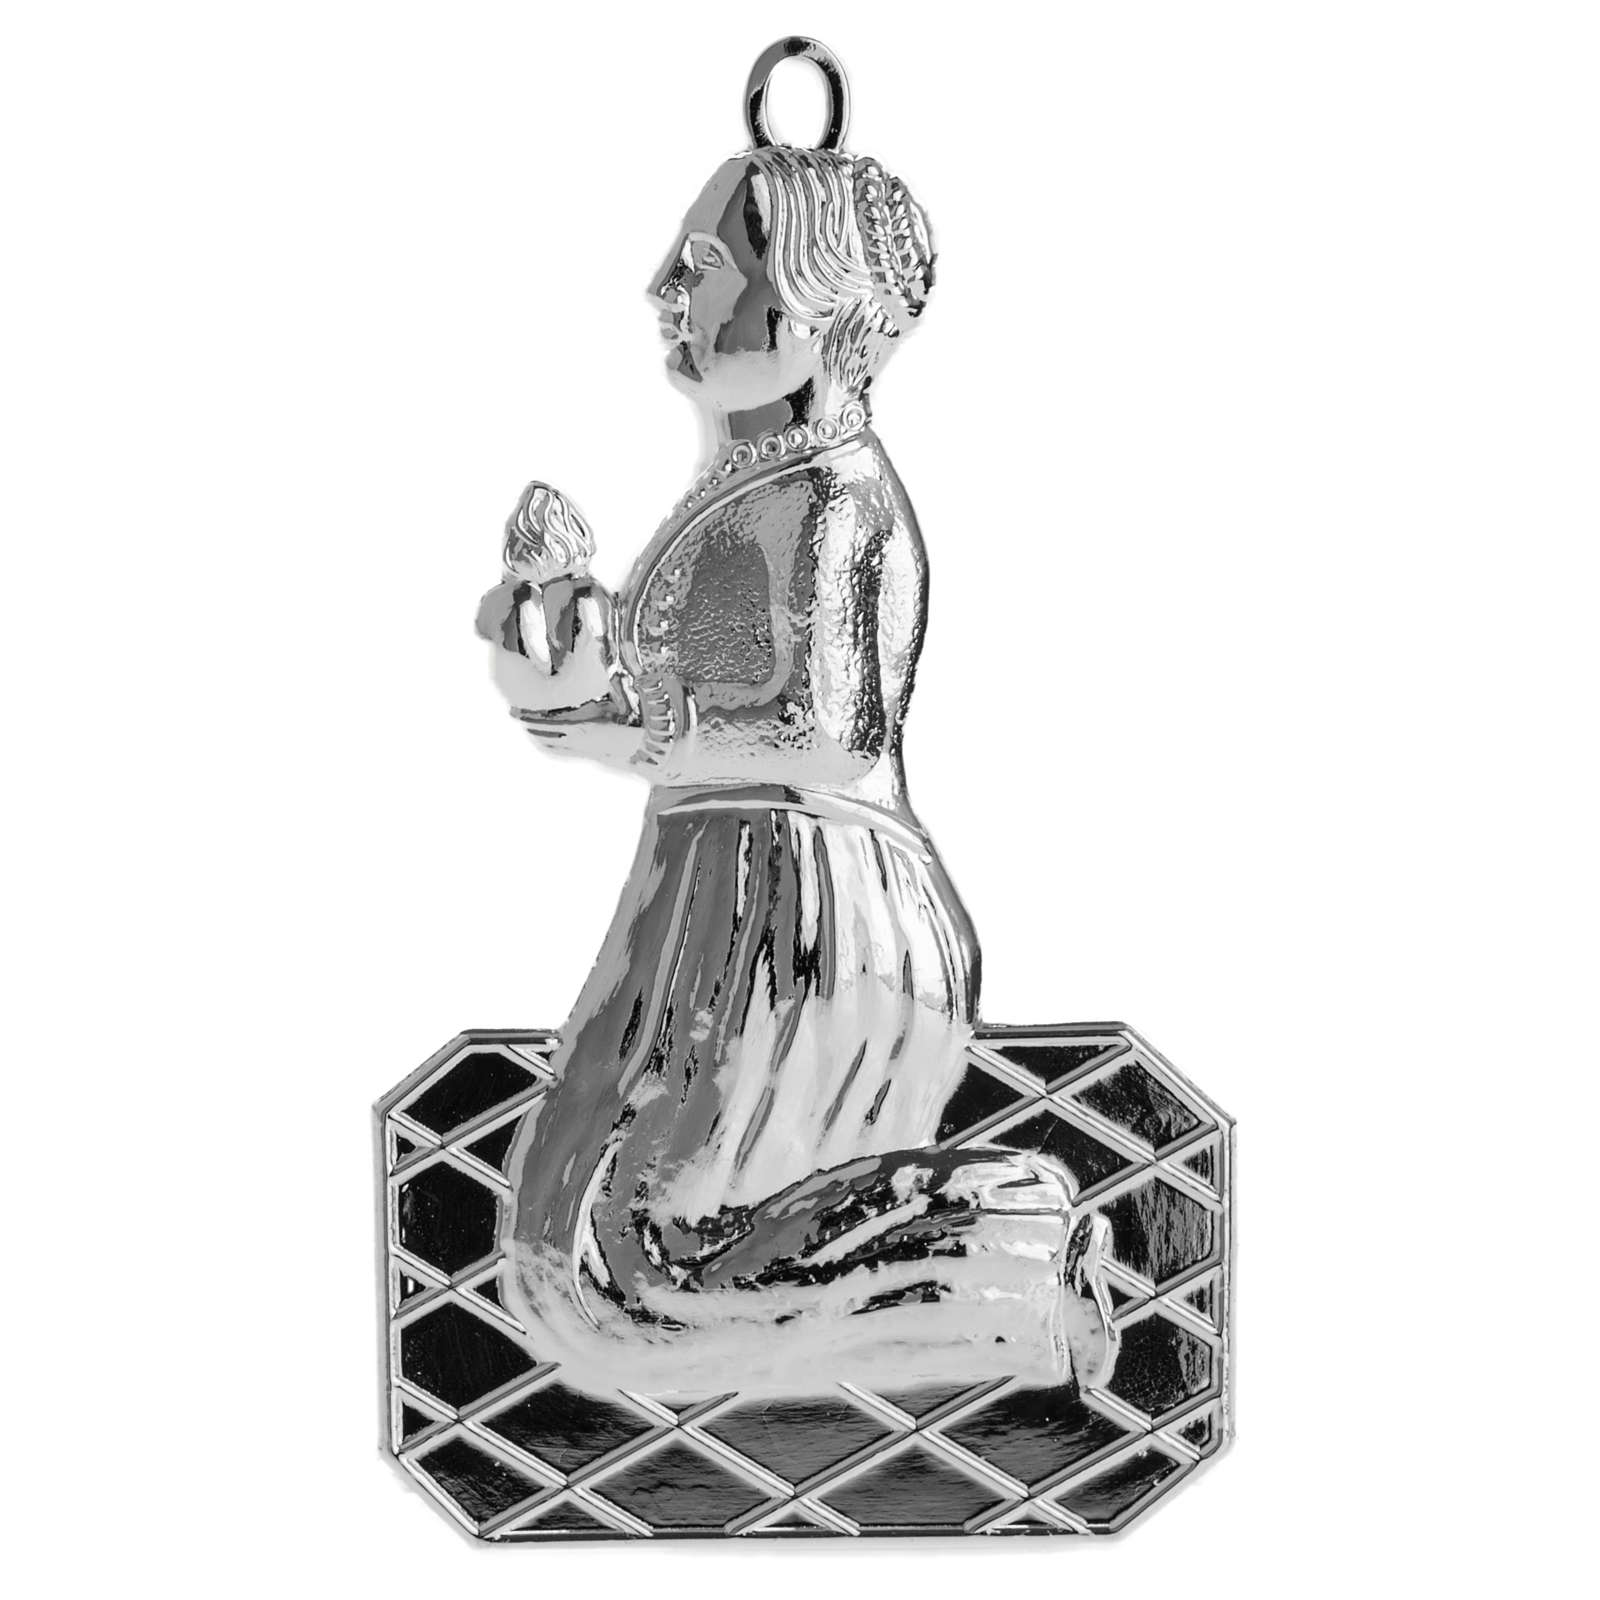 Ex-voto mujer plata 925 o metal 12 cm. 3